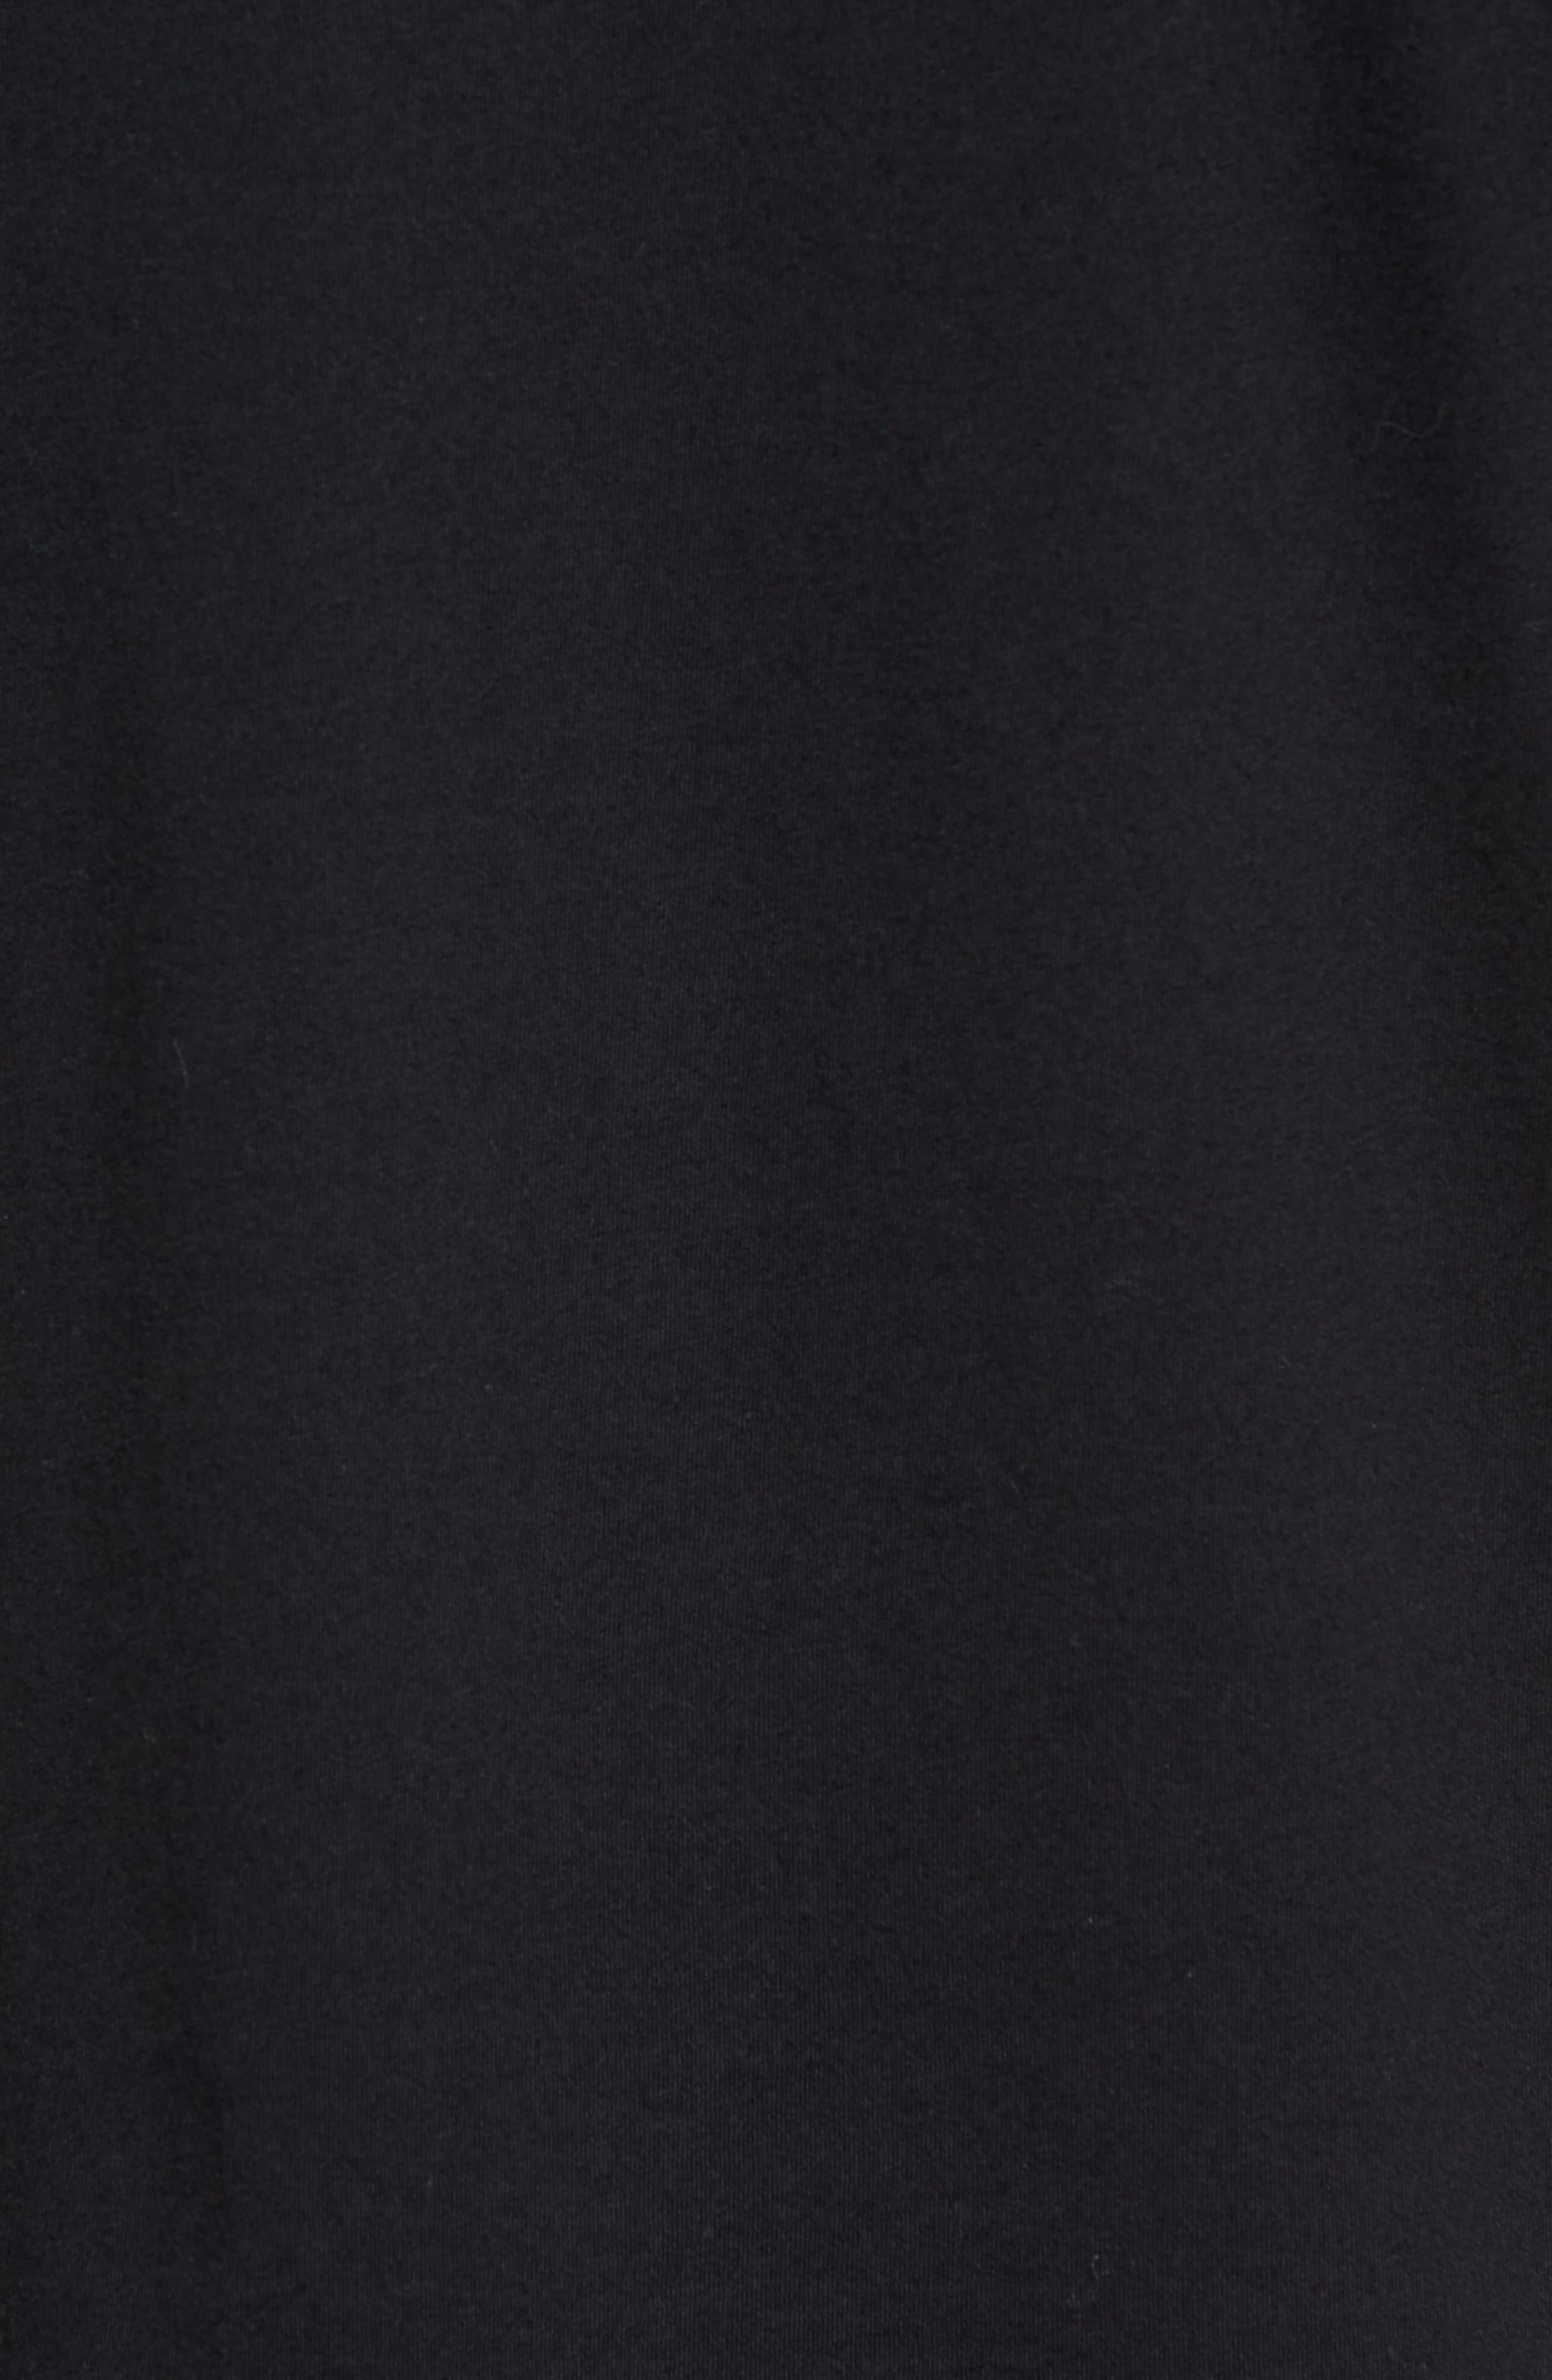 John Varvatos Guns N' Roses Graphic T-Shirt,                             Alternate thumbnail 5, color,                             001